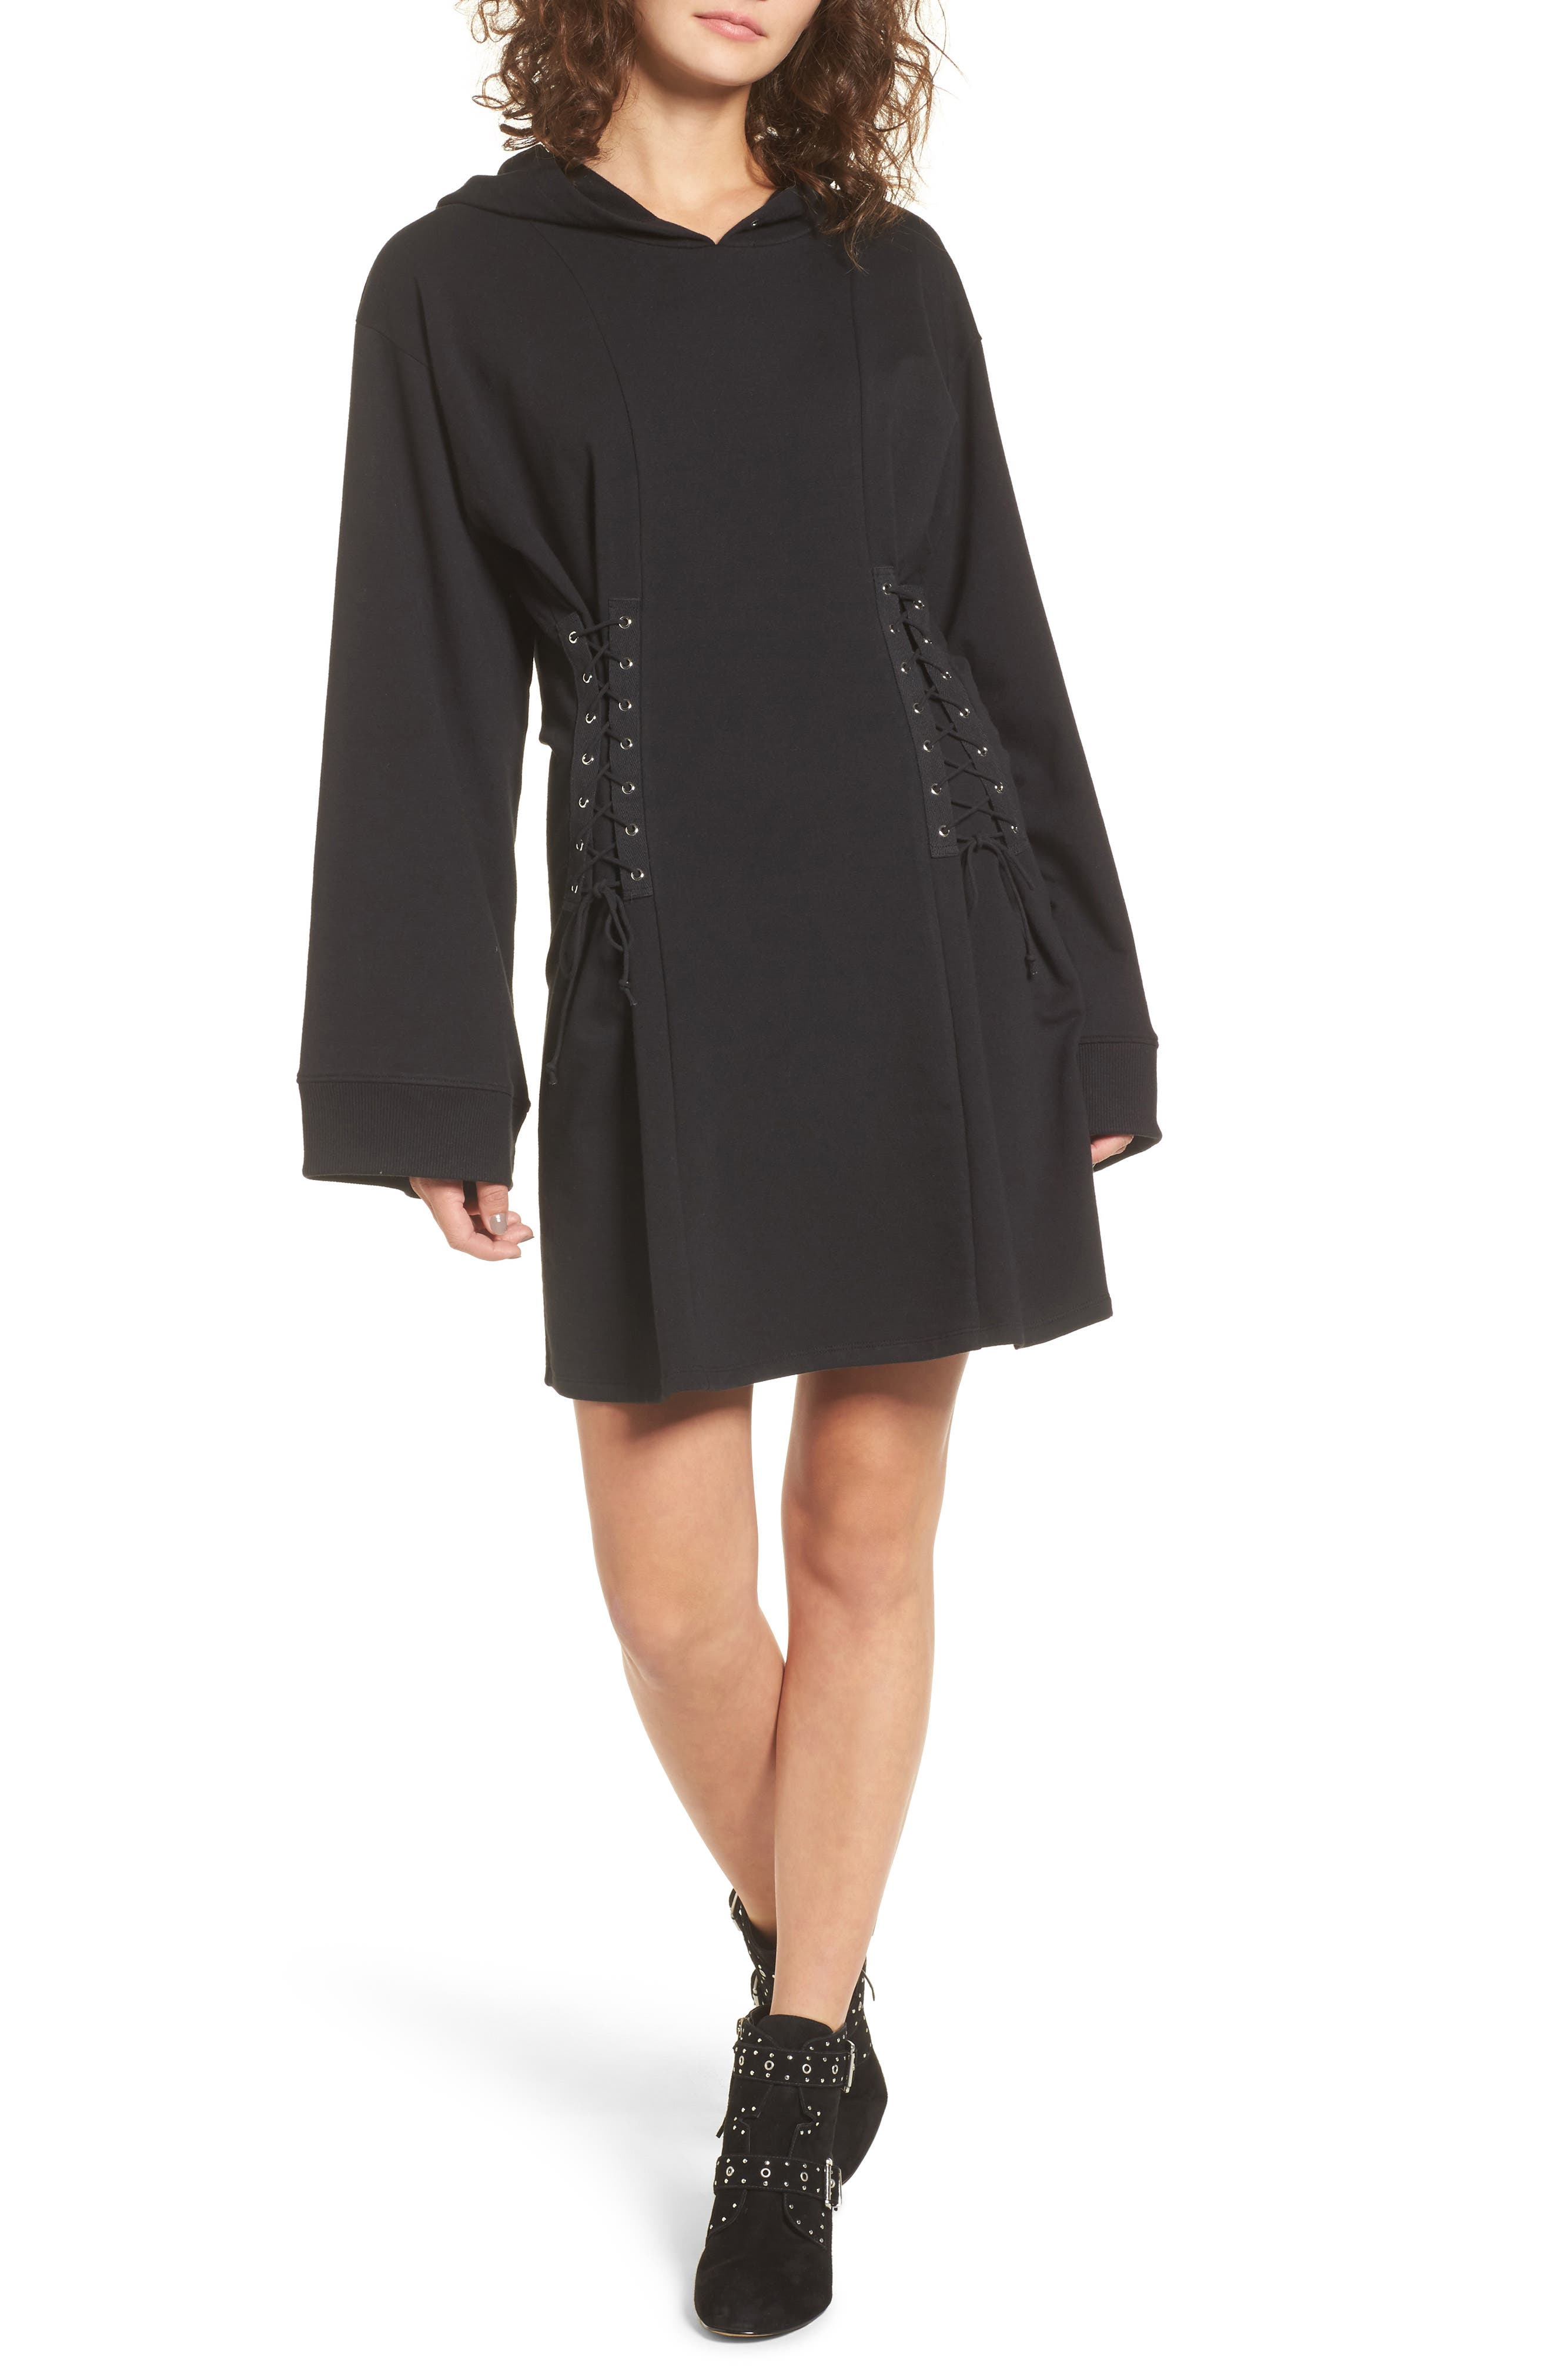 Corset Hoodie Sweatshirt Dress,                         Main,                         color, Black